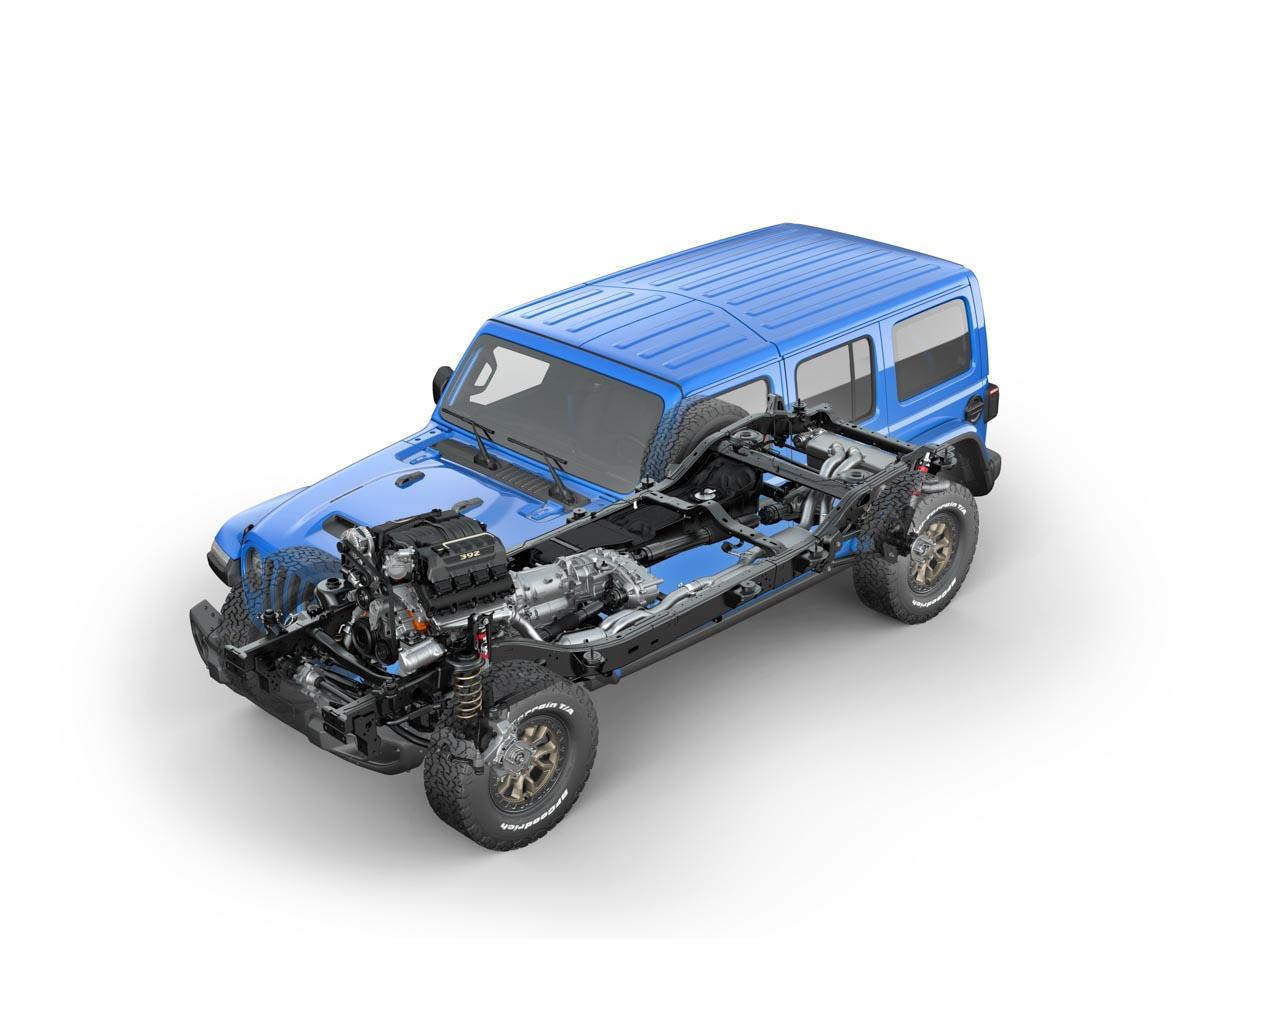 Jeep Wrangler Rubicon 392 V8 Rahmen